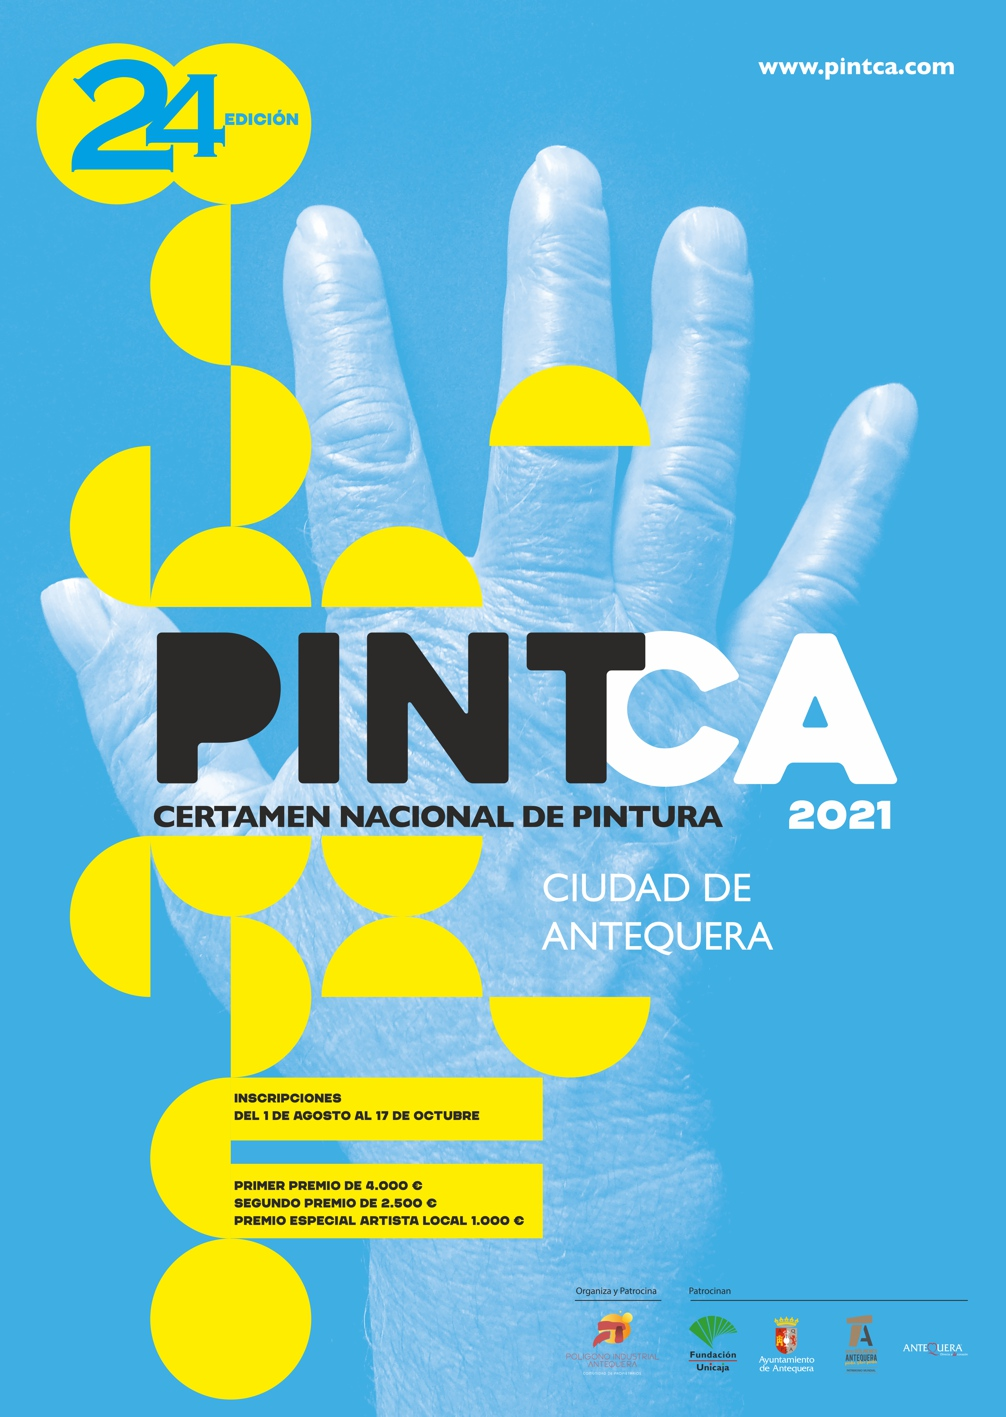 XXIV Certamen Nacional de Pintura Ciudad de Antequera 2021